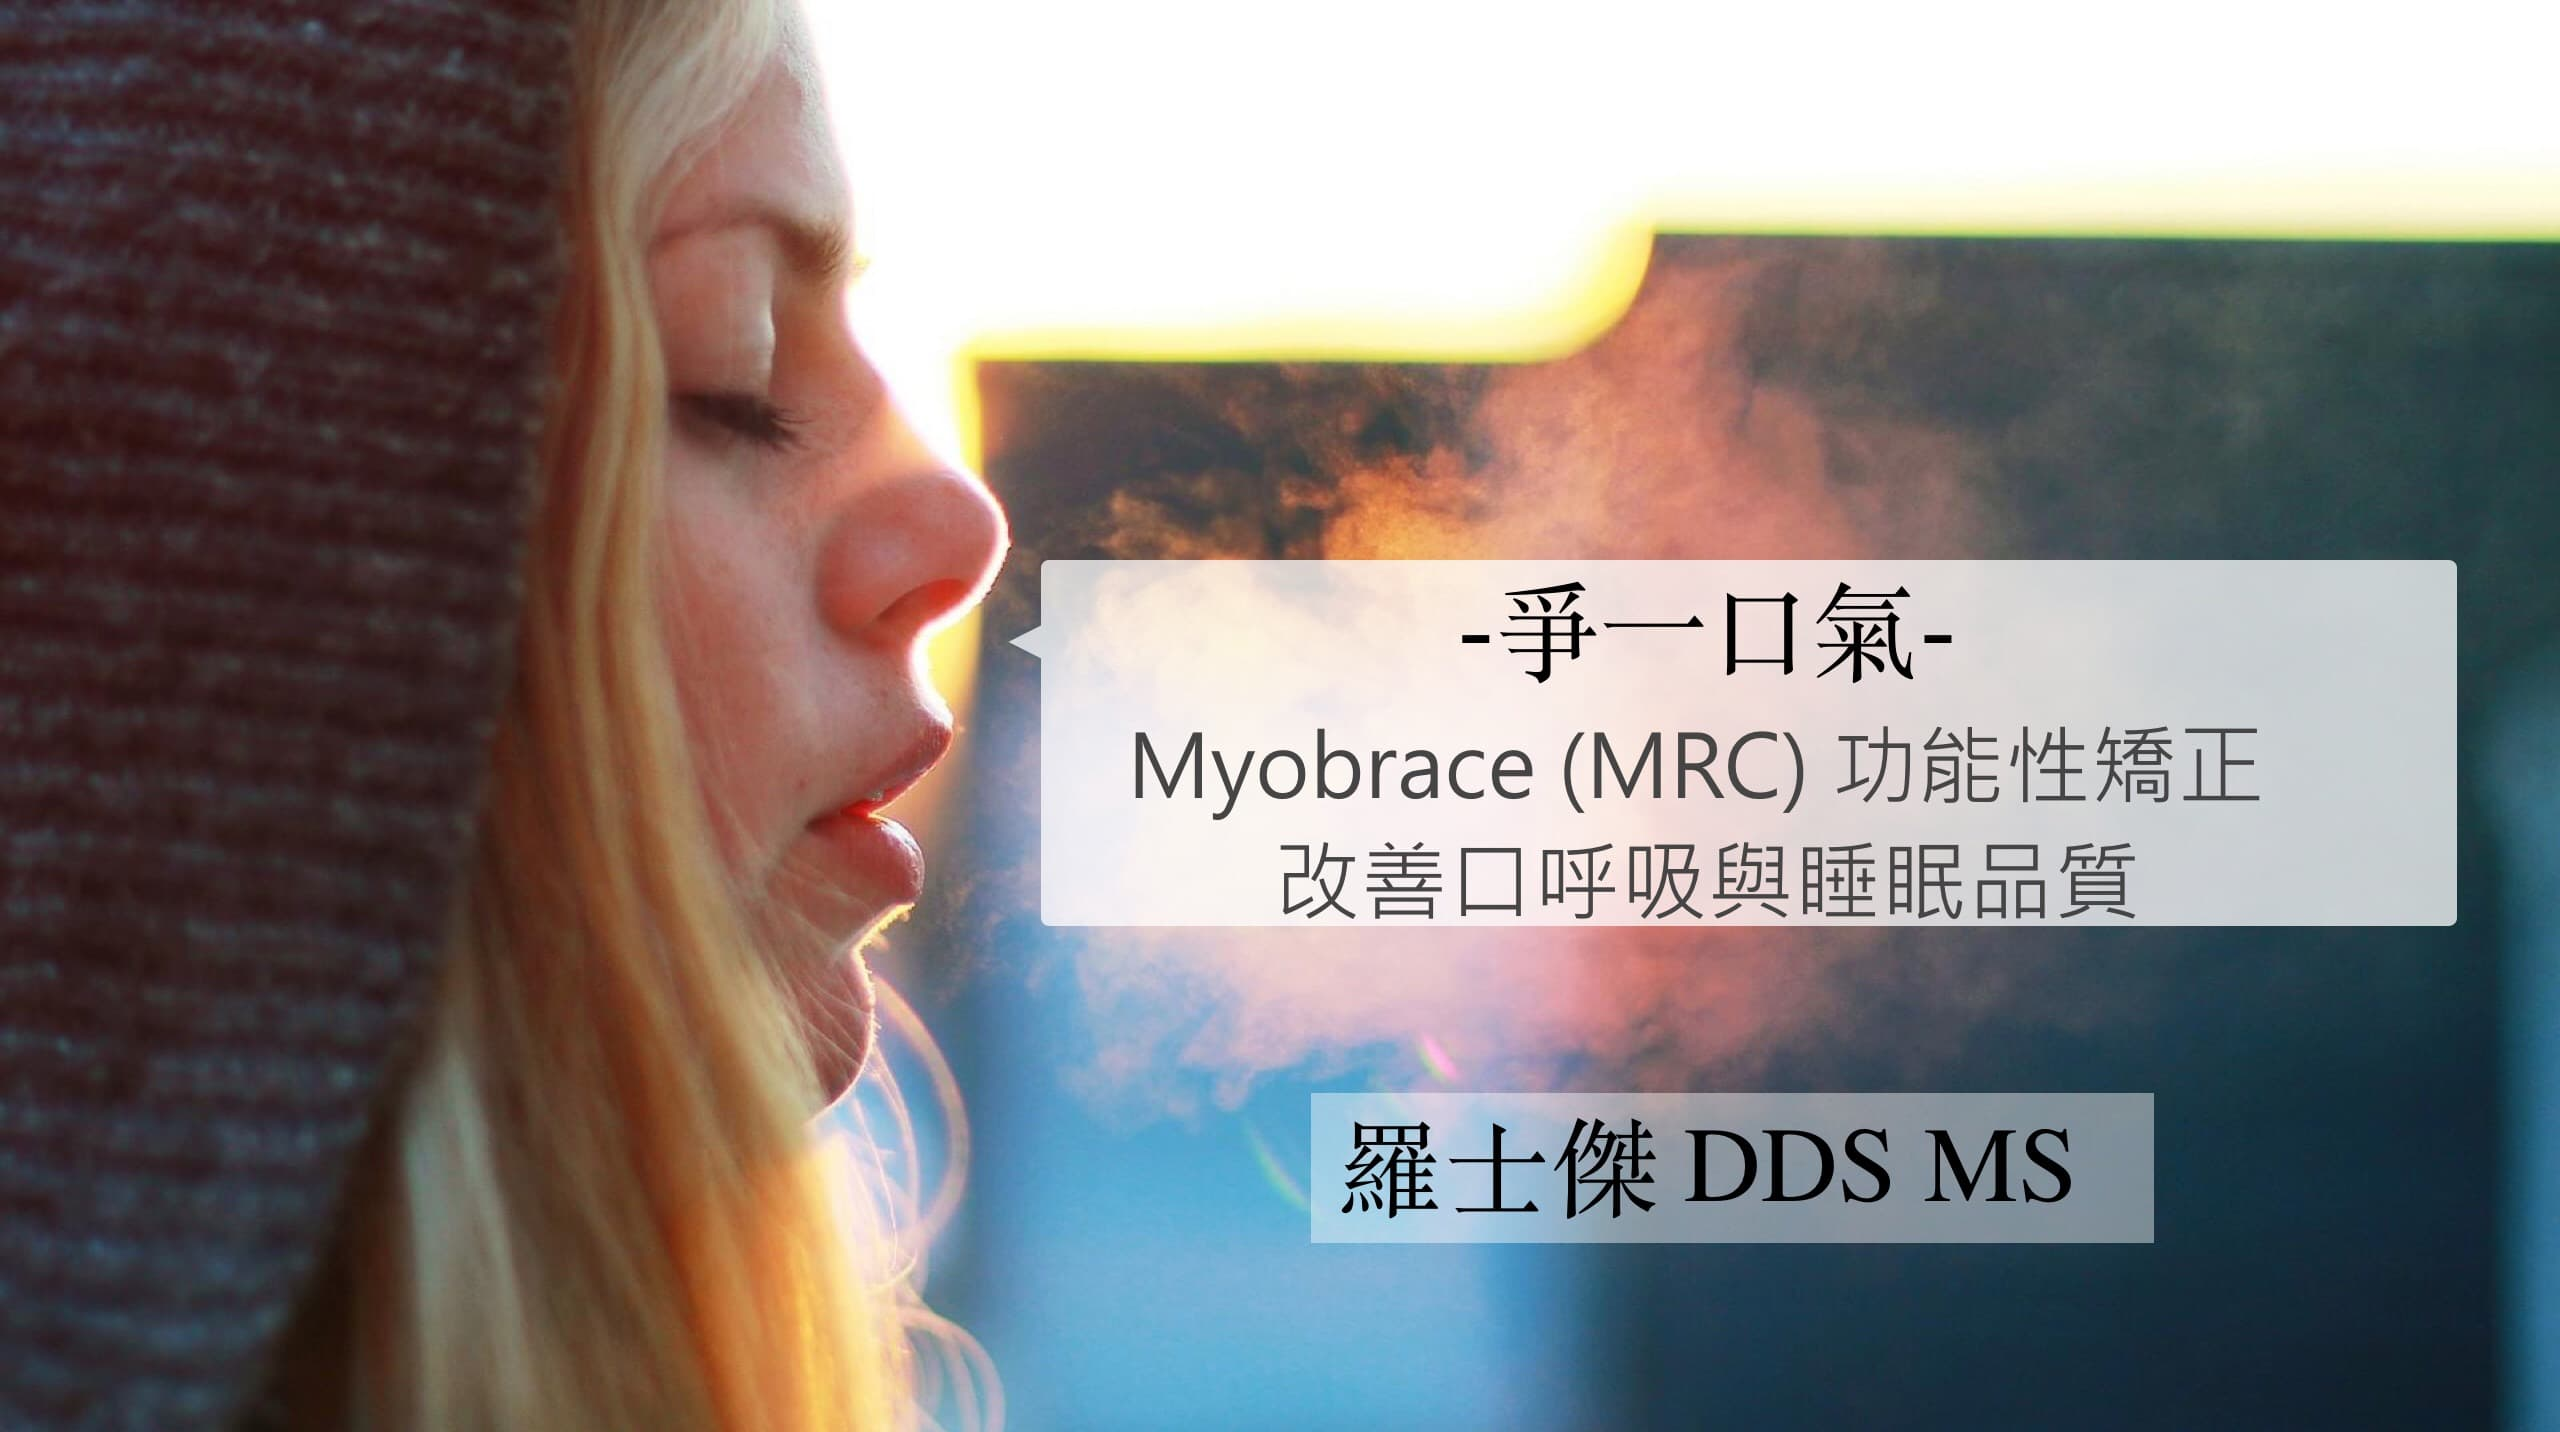 MRC, Myobrace, 功能性矯正